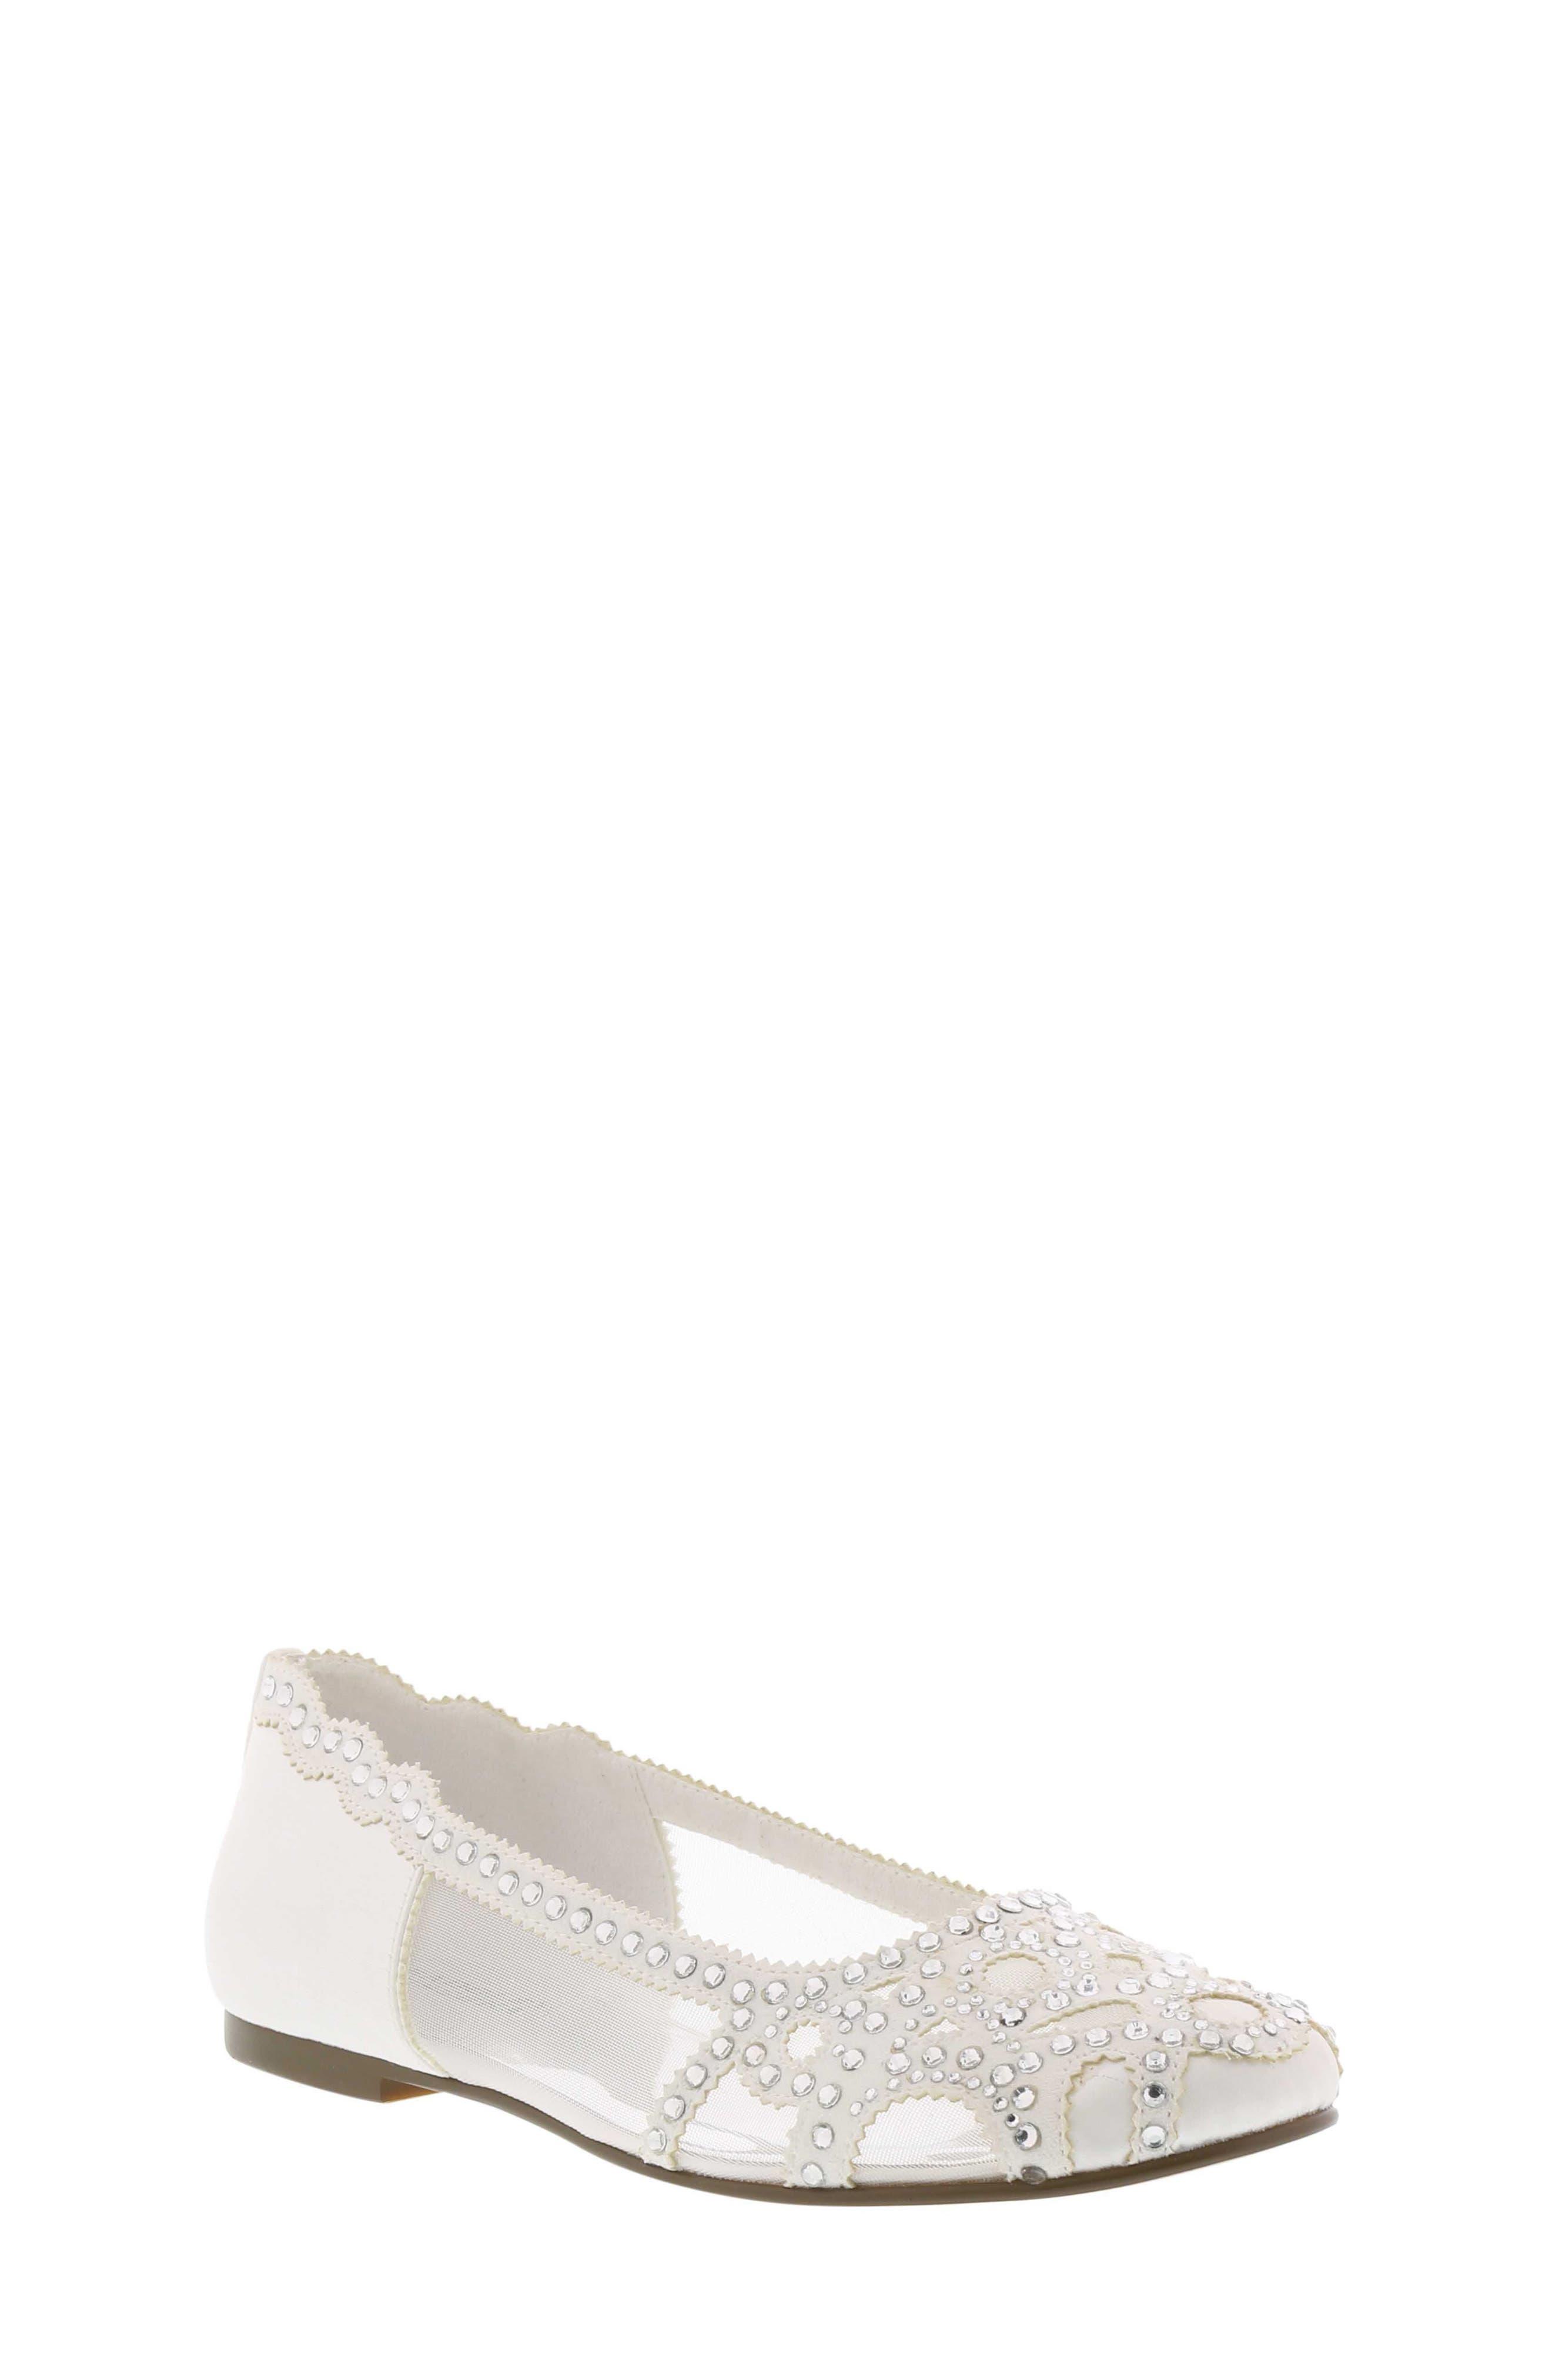 BADGLEY MISCHKA COLLECTION Badgley Mischka Gigi Embellished Flat, Main, color, WHITE